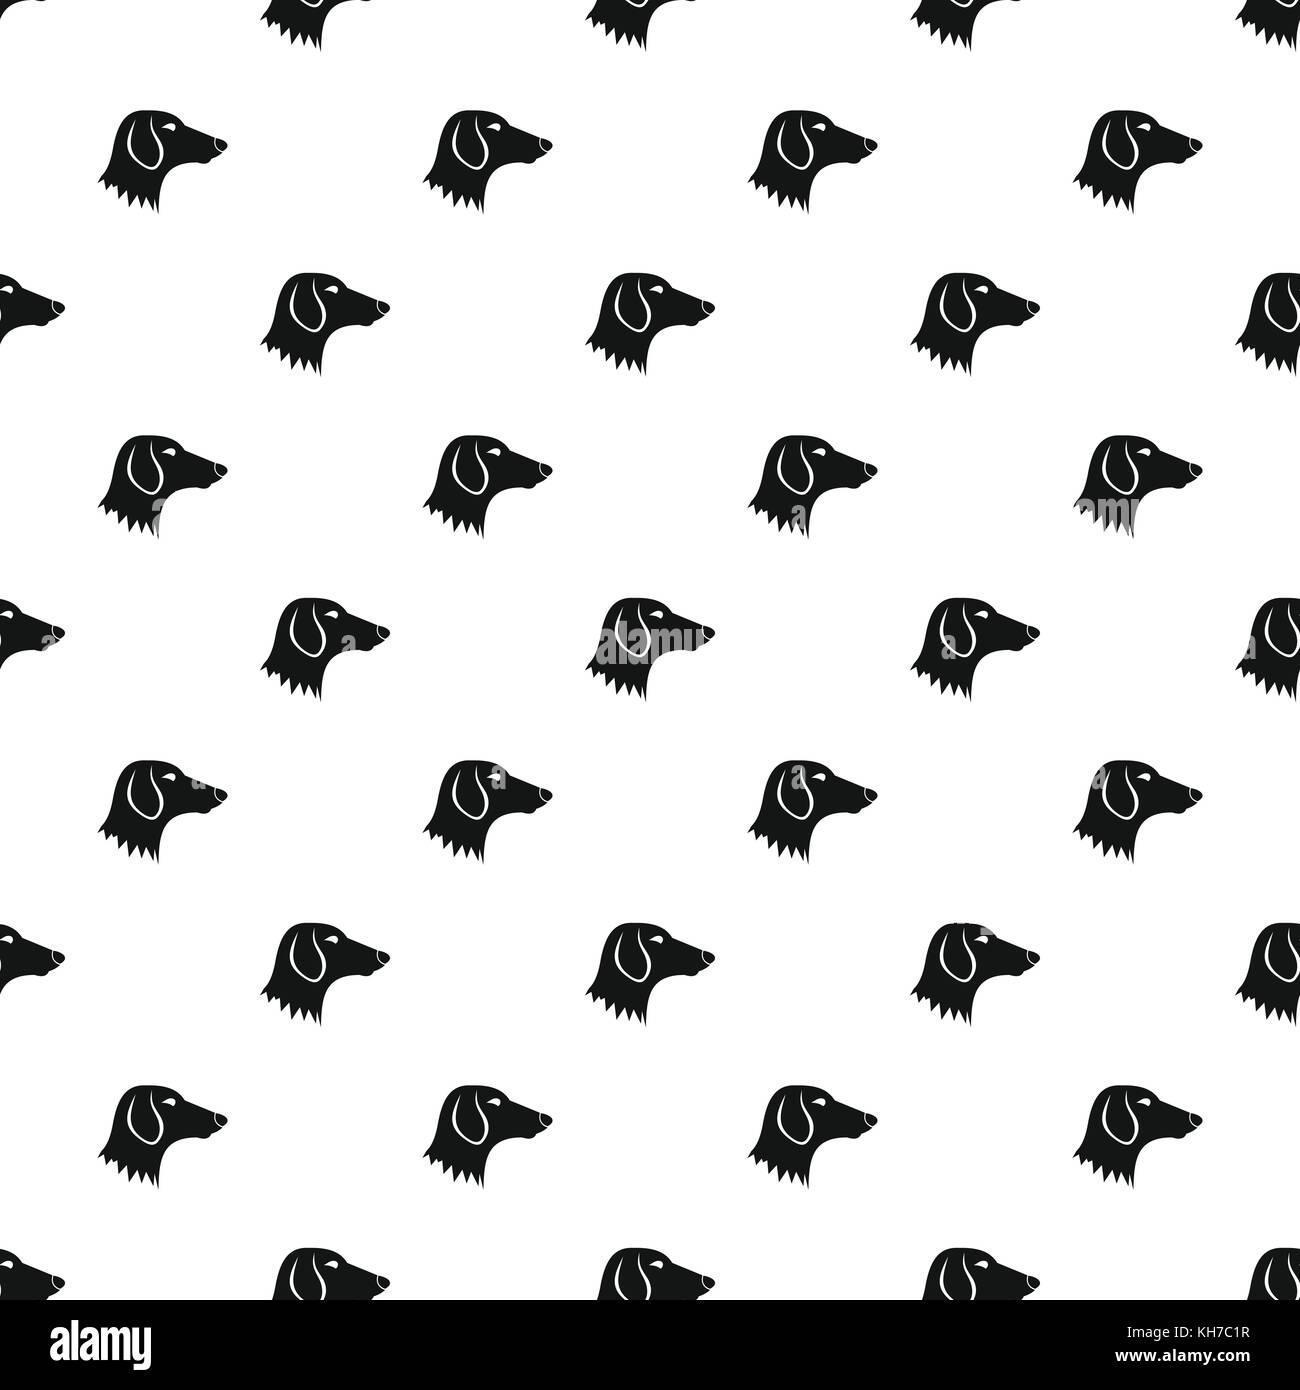 Dachshund dog pattern, simple style - Stock Image